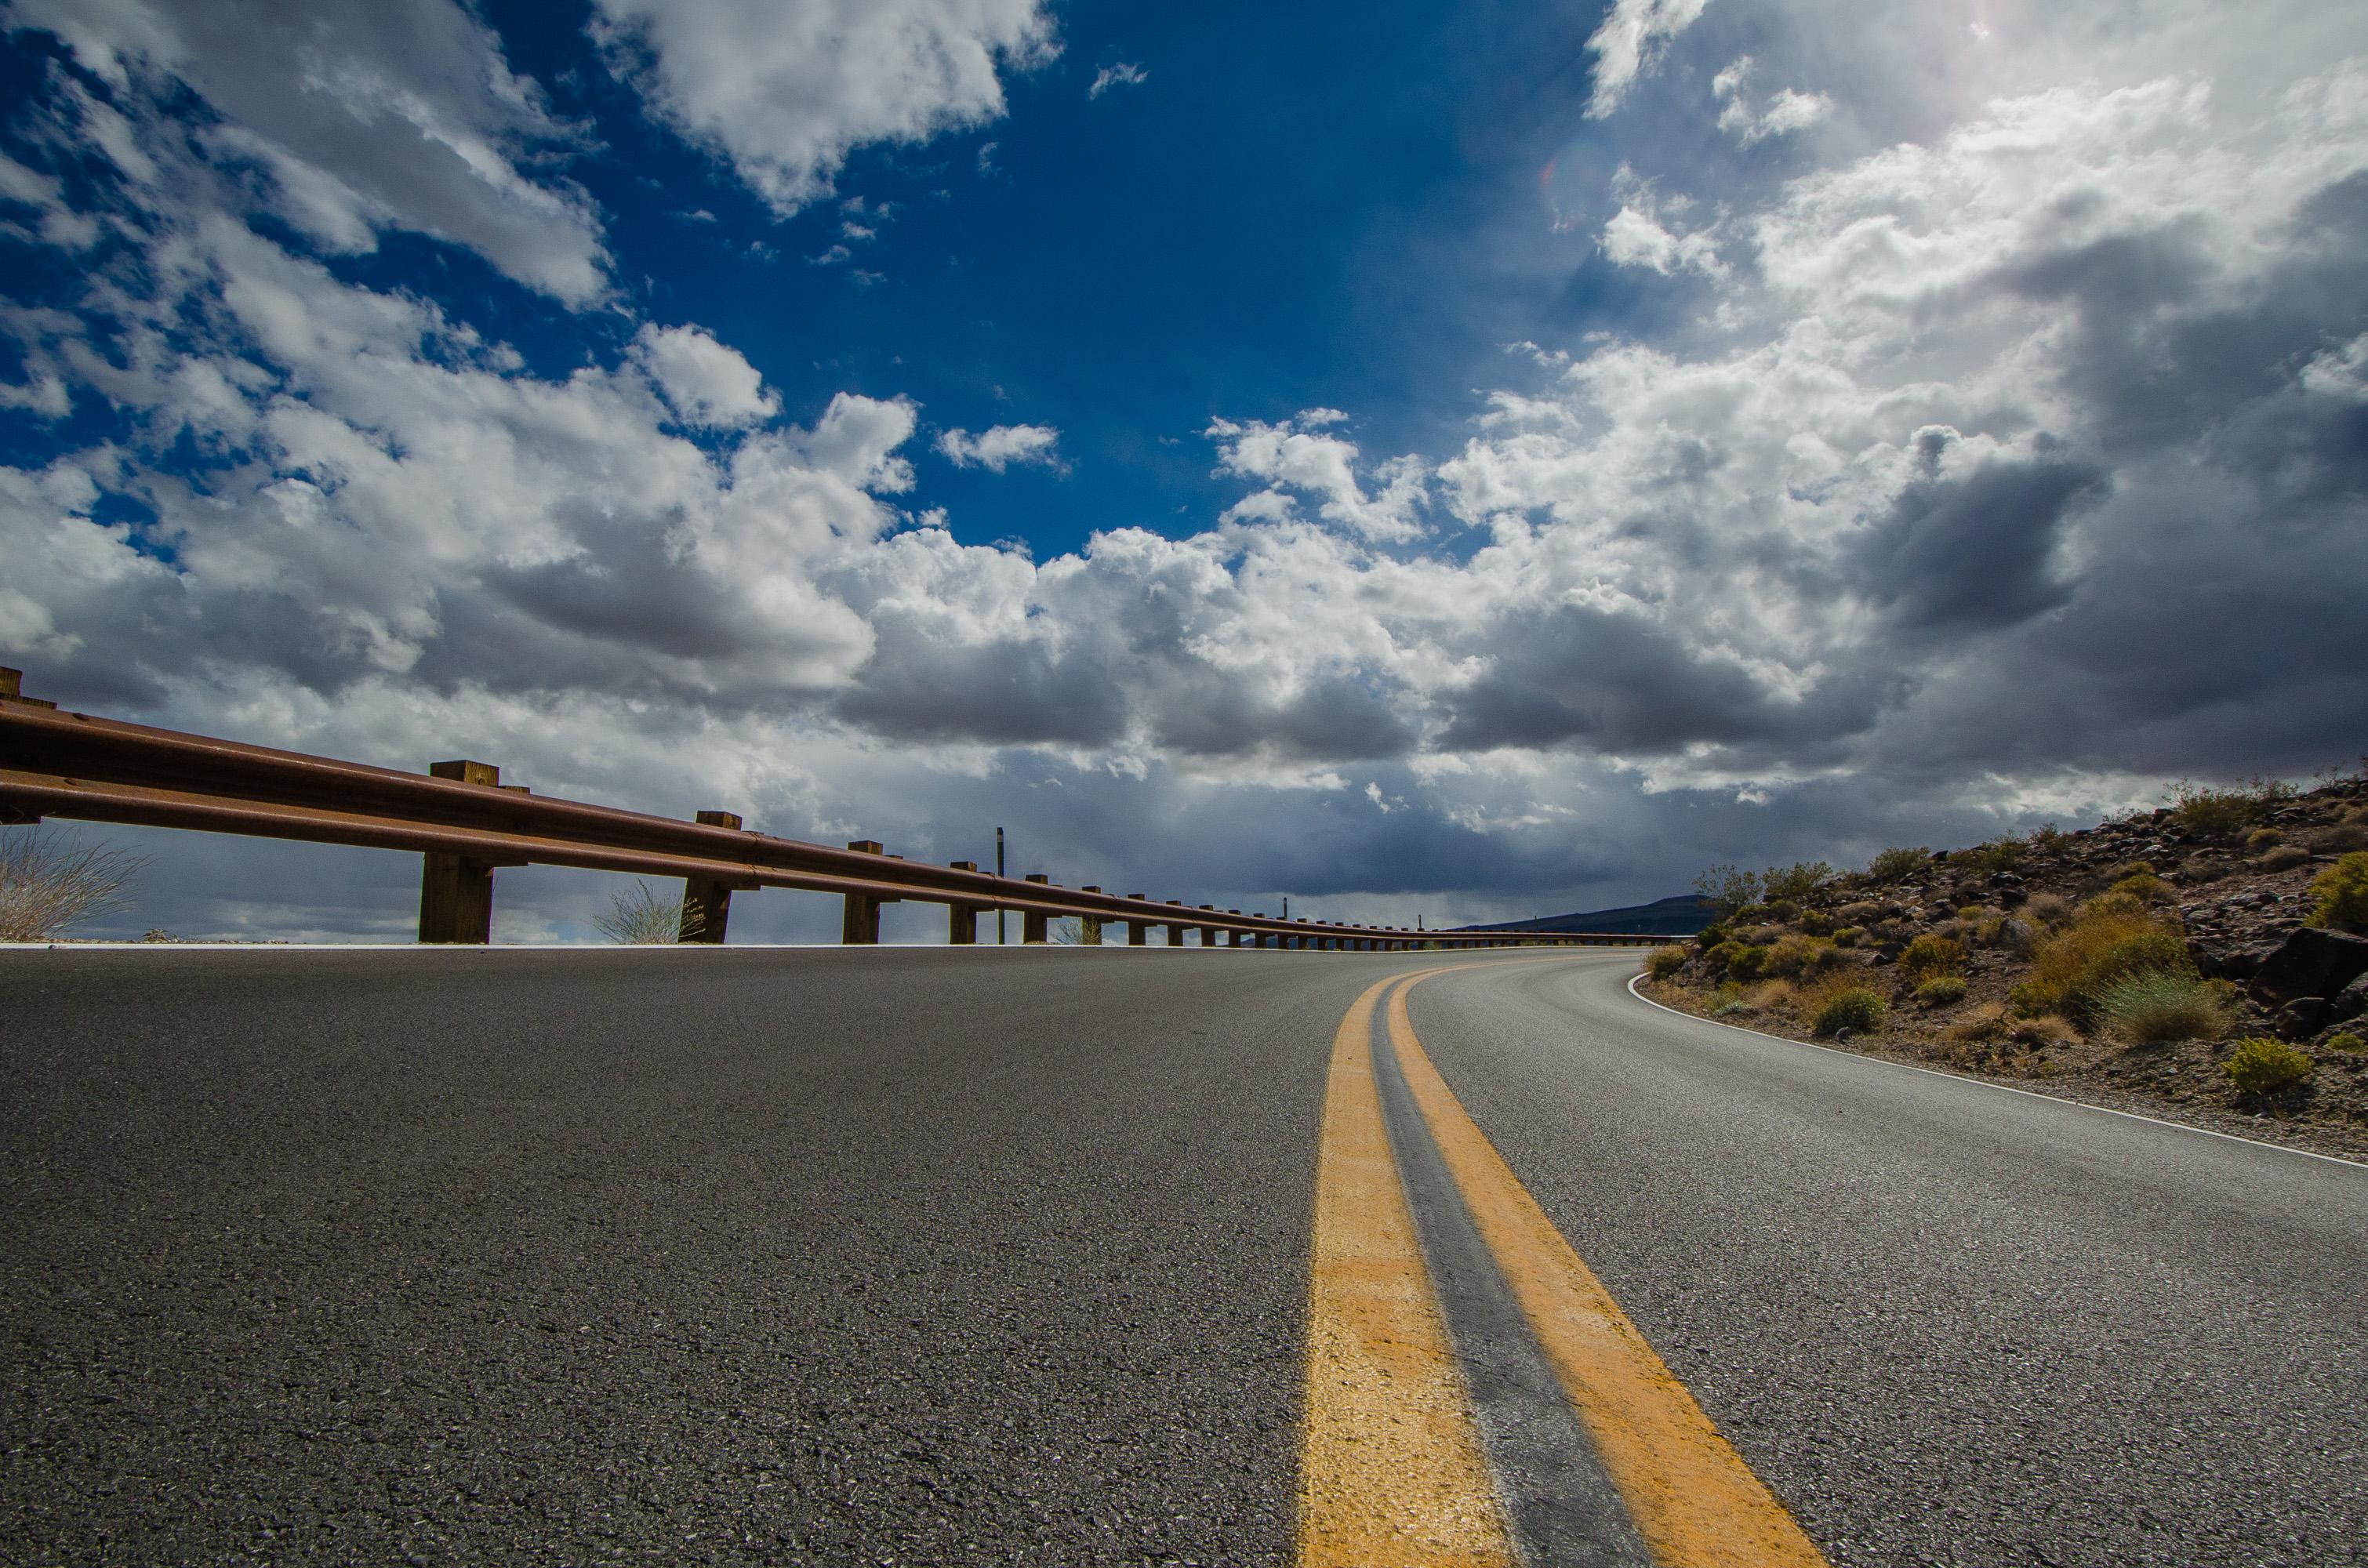 Roadtrip USA & Kanada mit dem eigenen Wohnmobil – Planung